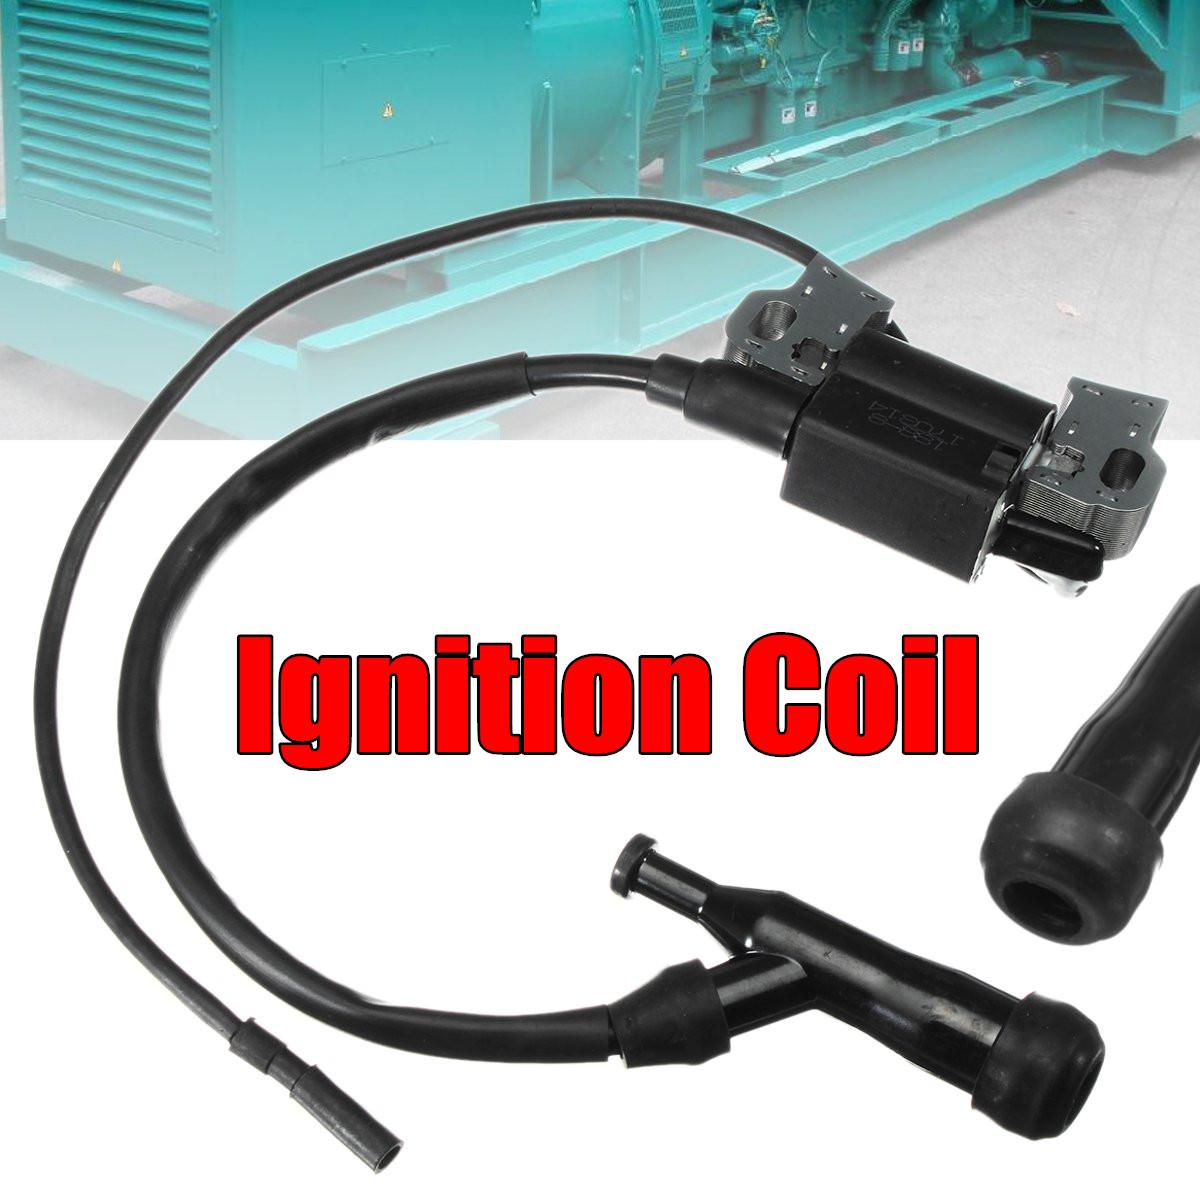 Generator Ignition Coil Assembly For Wen Power Pro 5500 6800 7000 9000 Watt